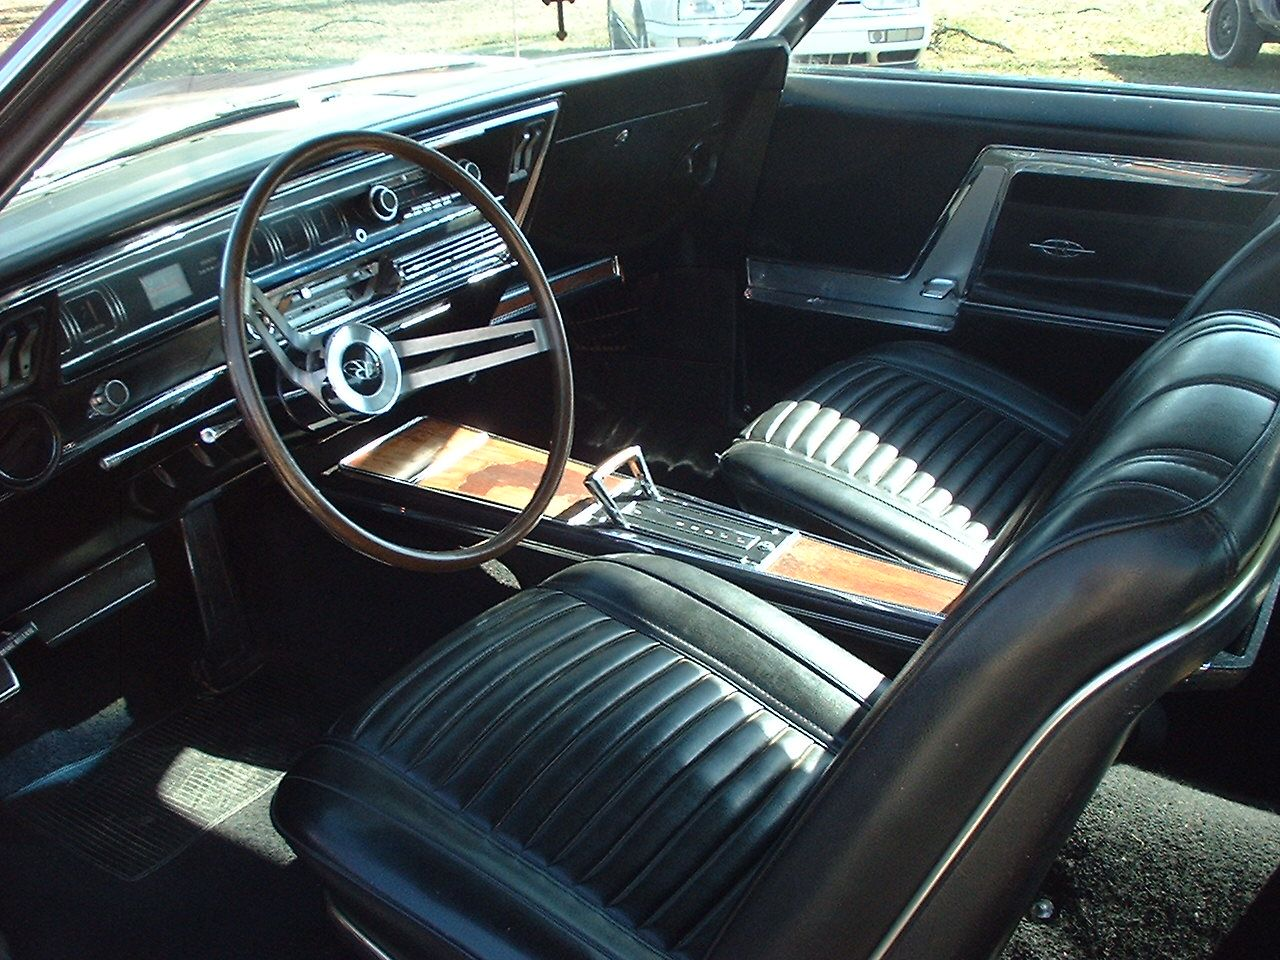 1971 Buick Riviera Interior Data Set